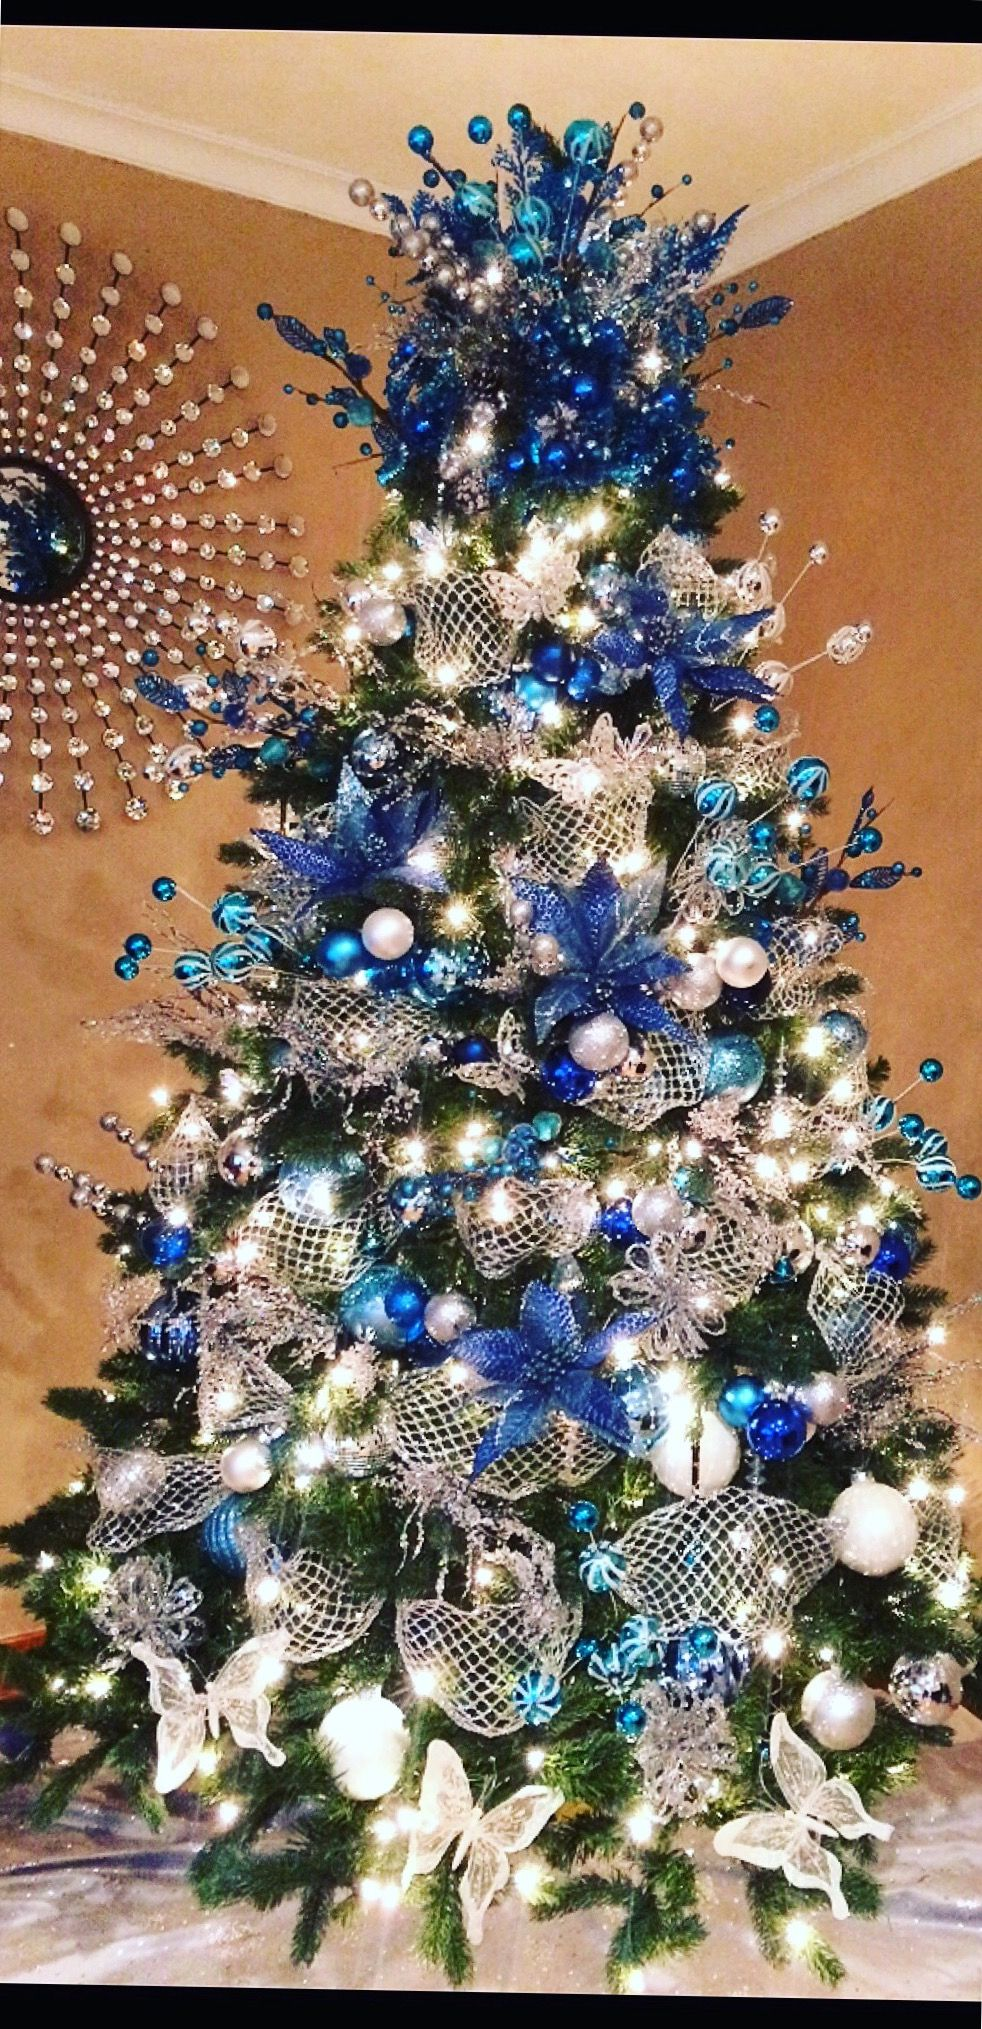 Blue And Silver Christmas Tree Arbol De Navidad Plateado Arboles Azules De Navidad Navidad Purpura